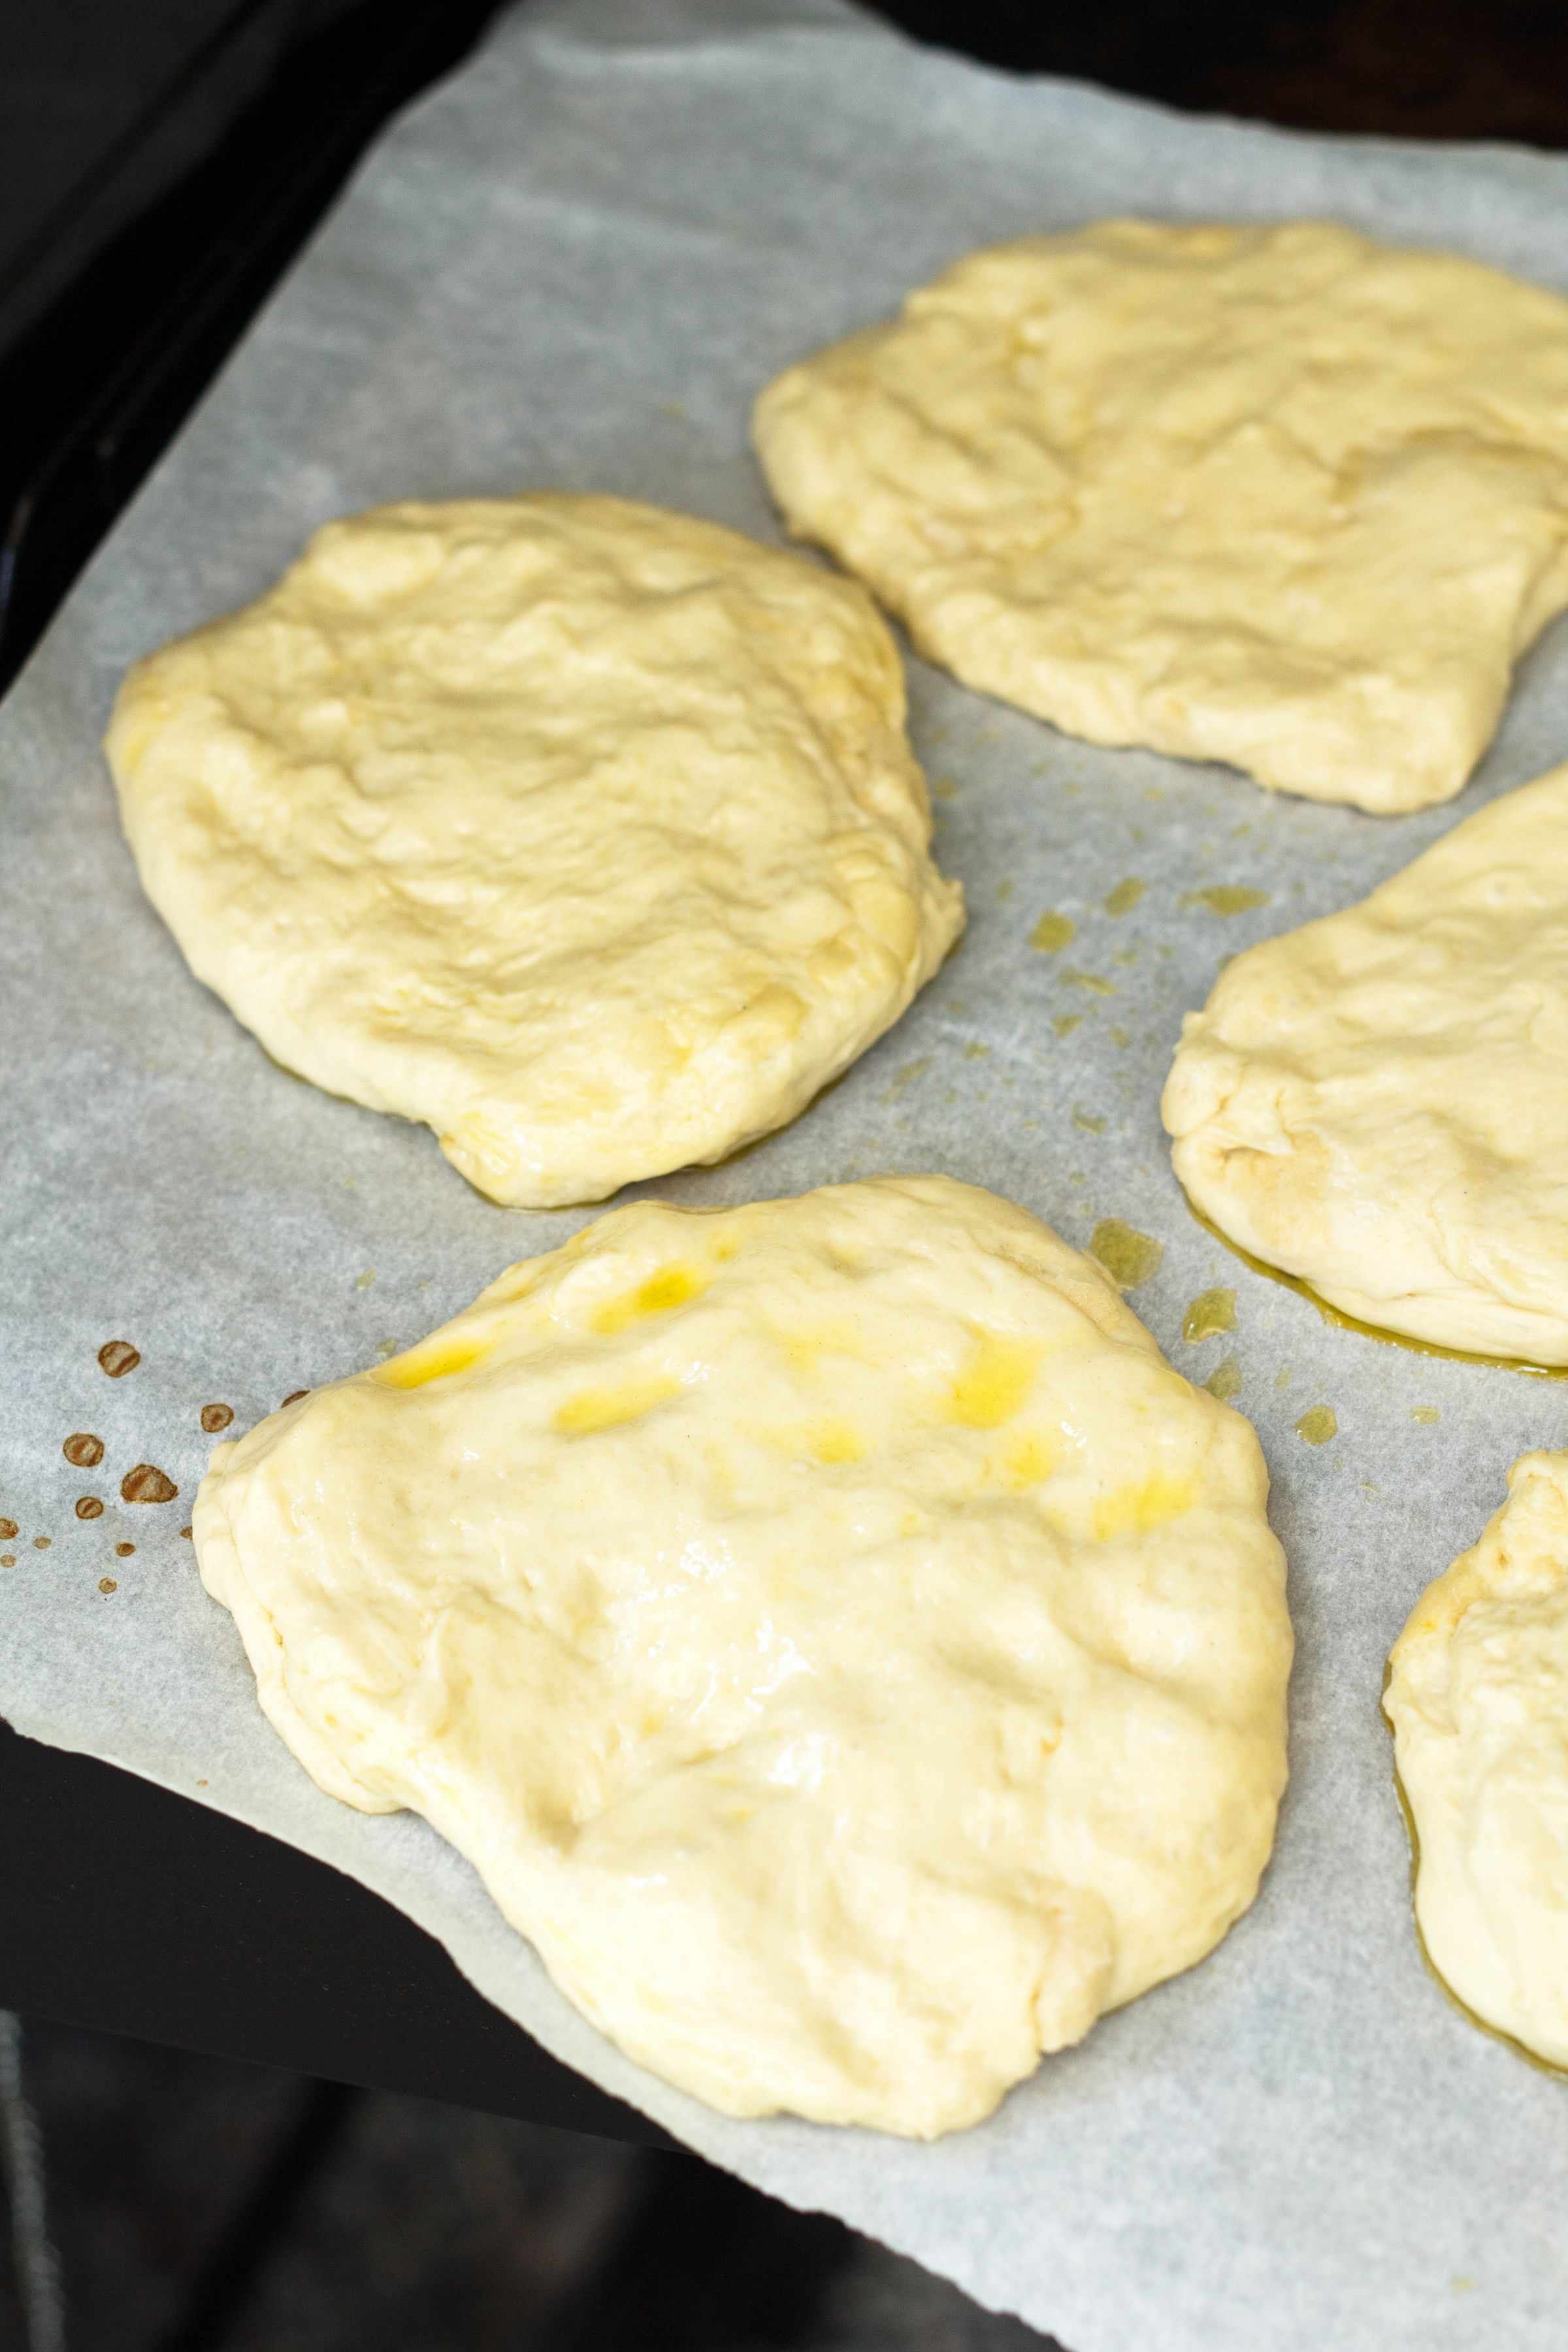 balls of flattened pizza dough